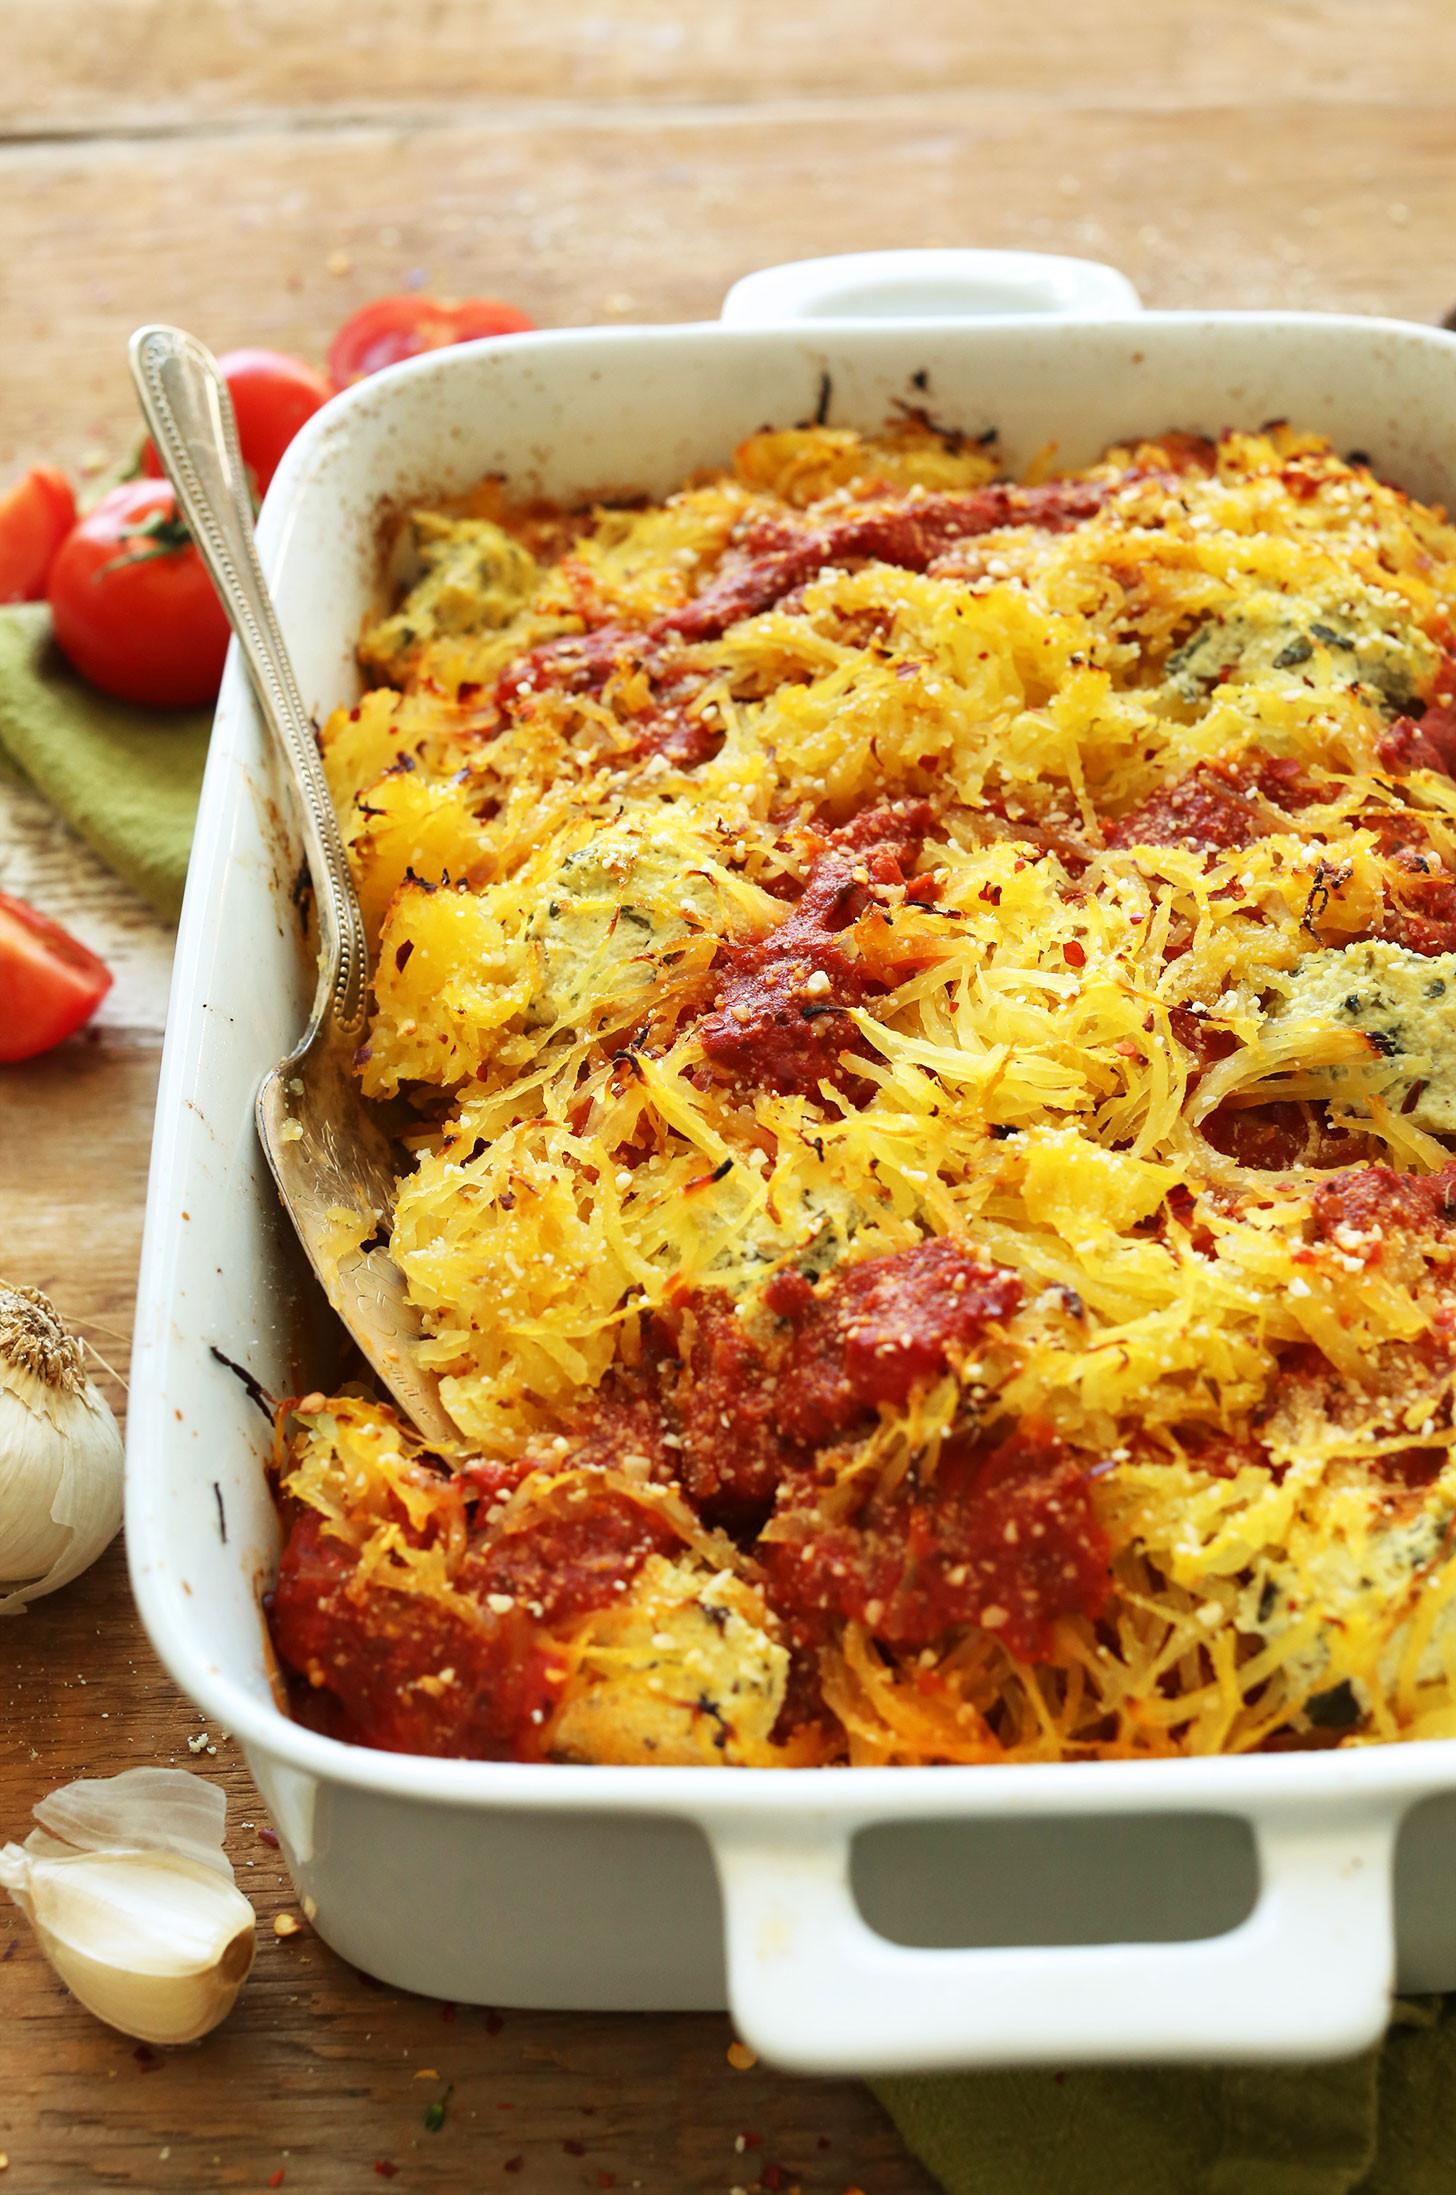 Spaghetti Squash Healthy Recipes  Spaghetti Squash Lasagna